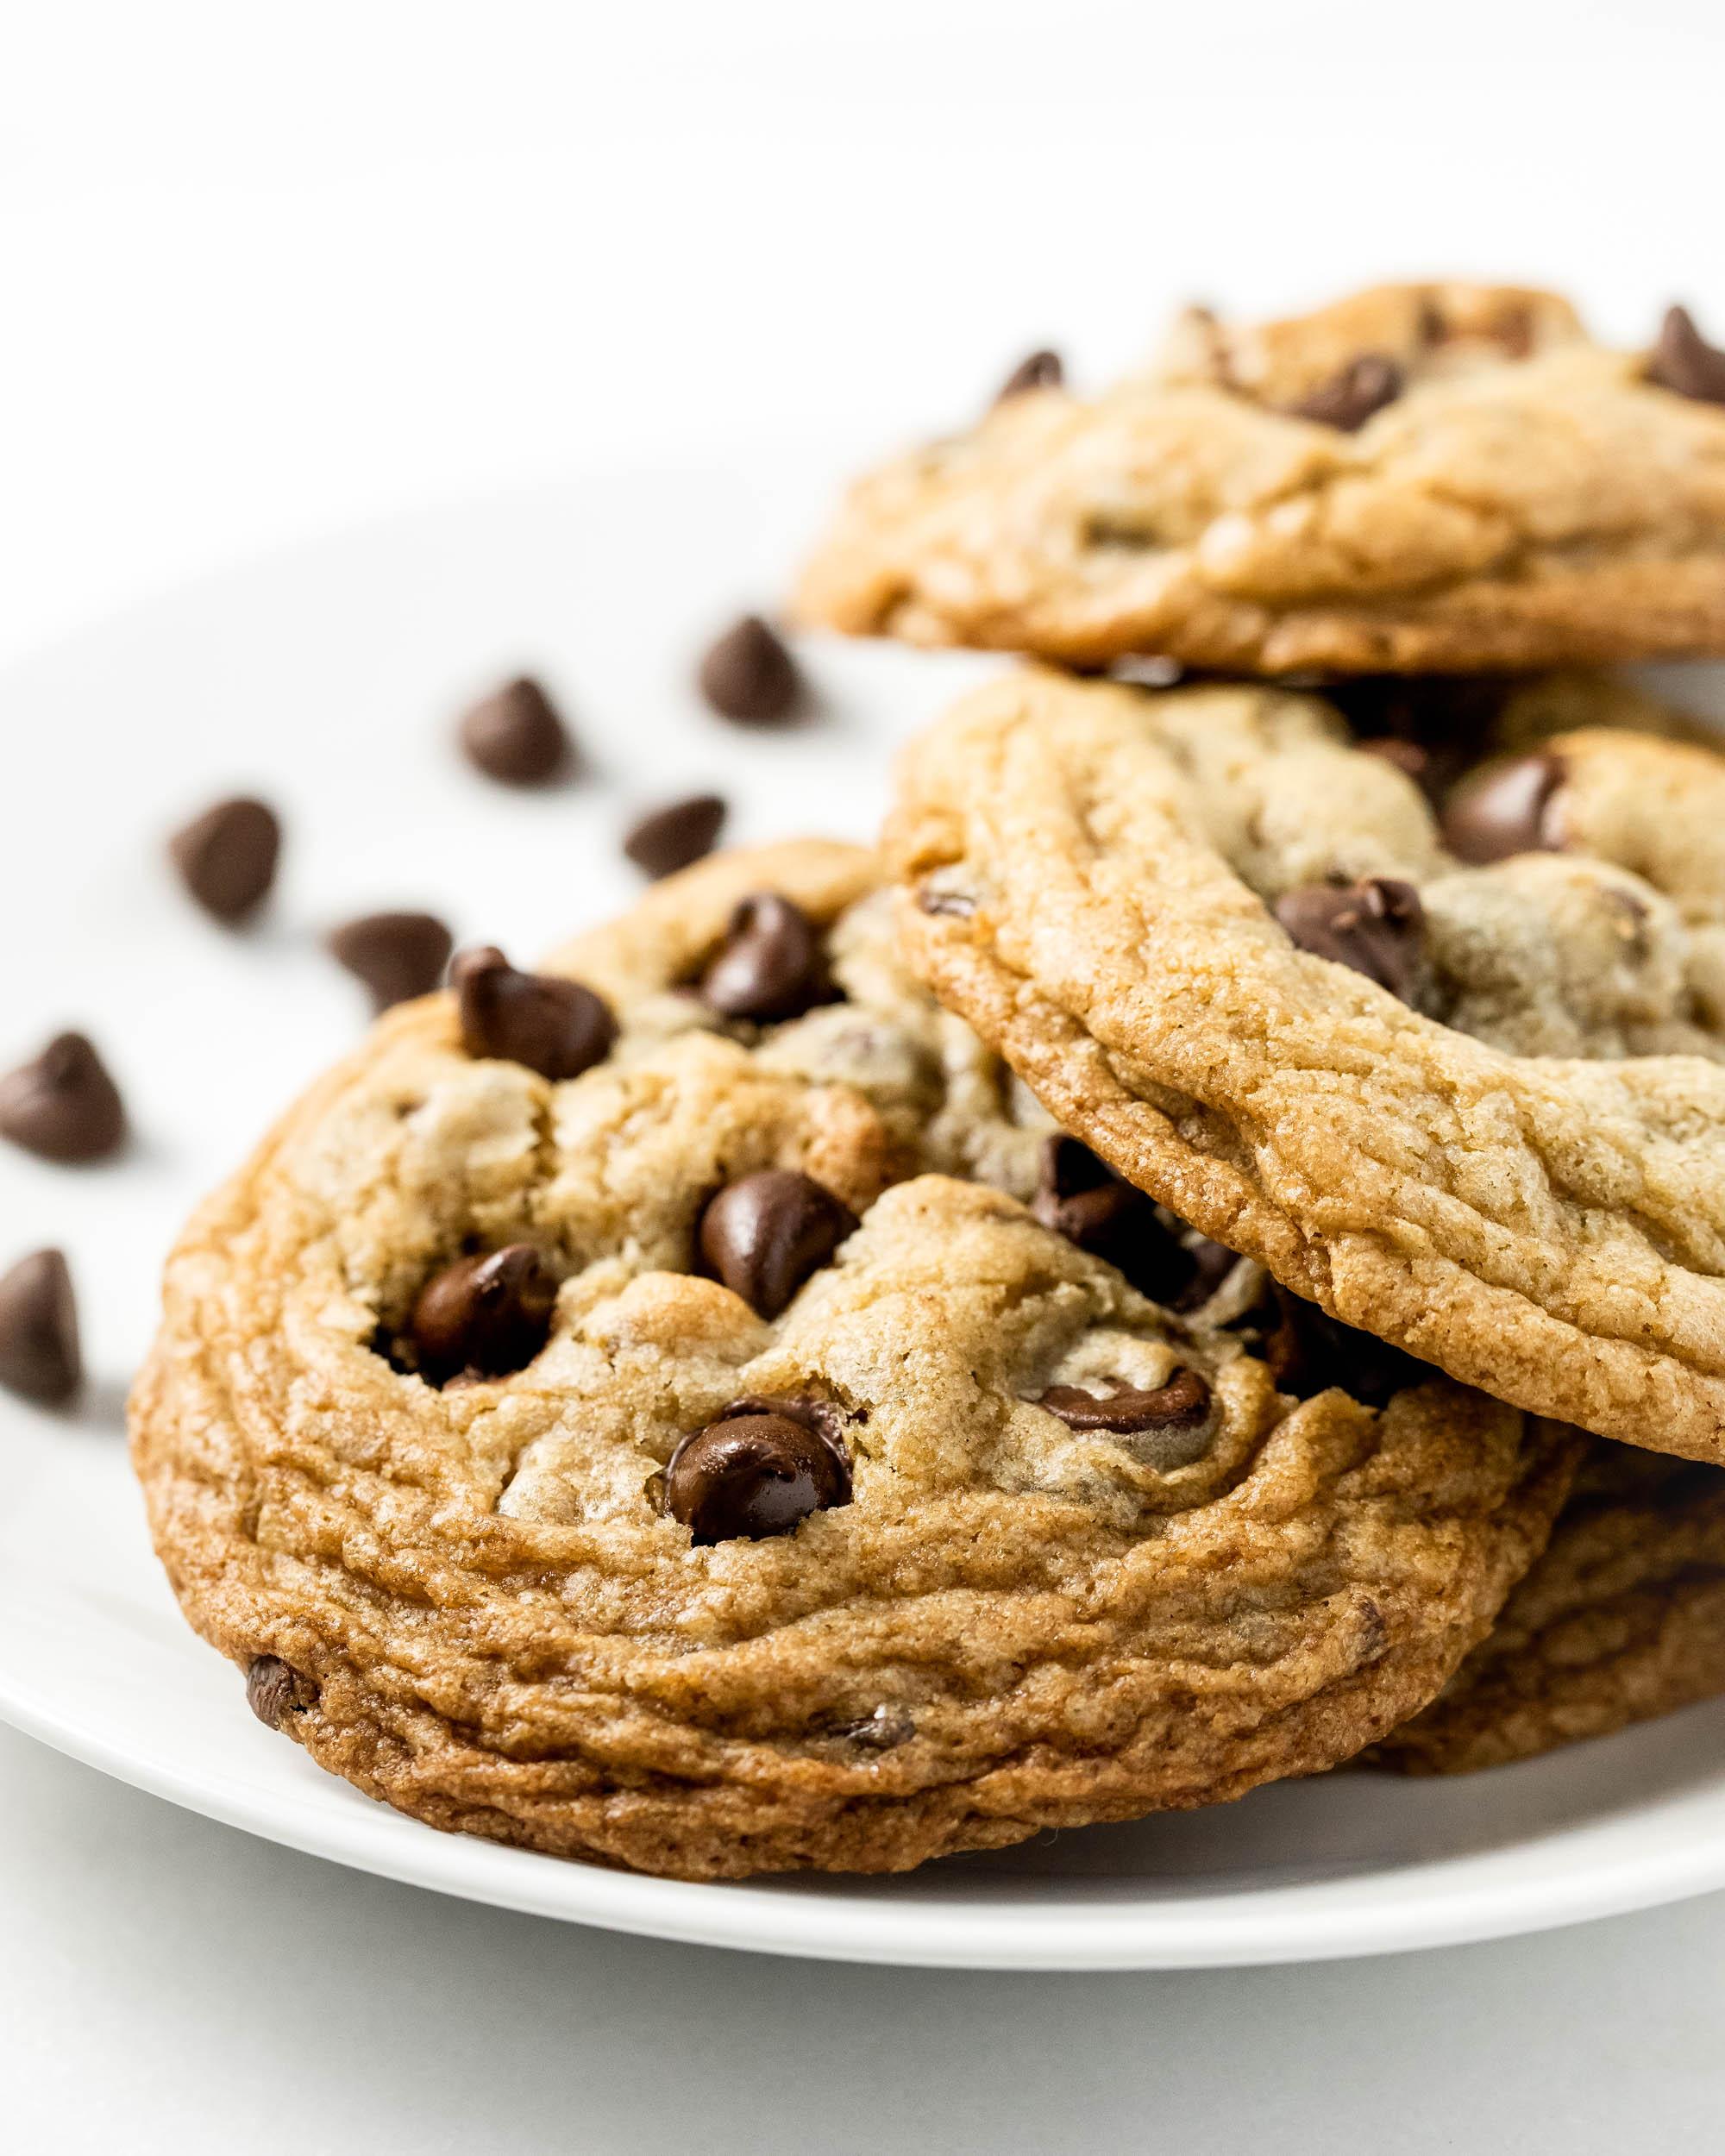 Chocolate Chip Cookies — Crinkly Cookie